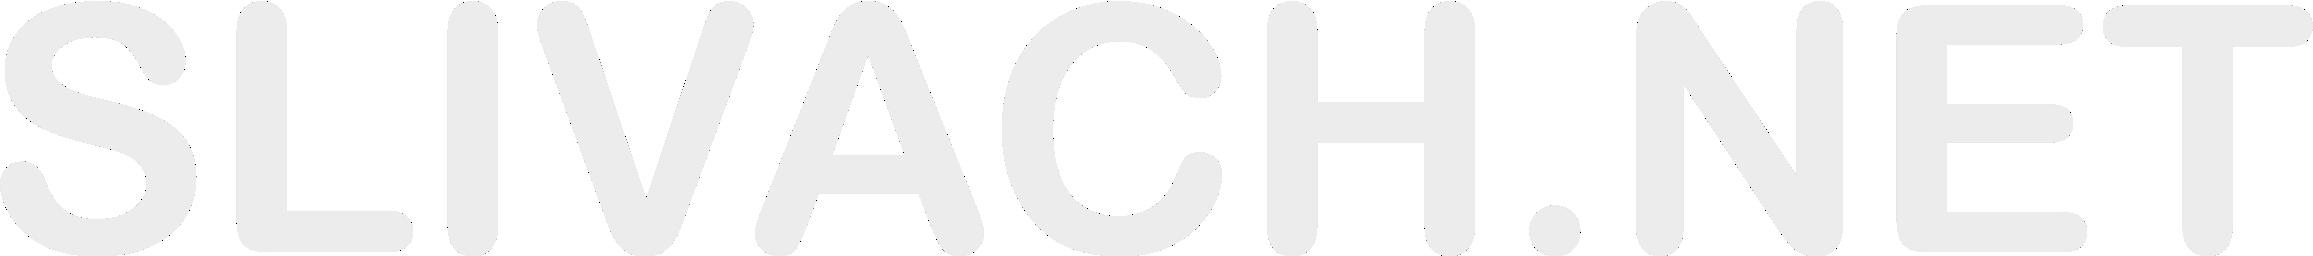 platnoe-besplatno.net